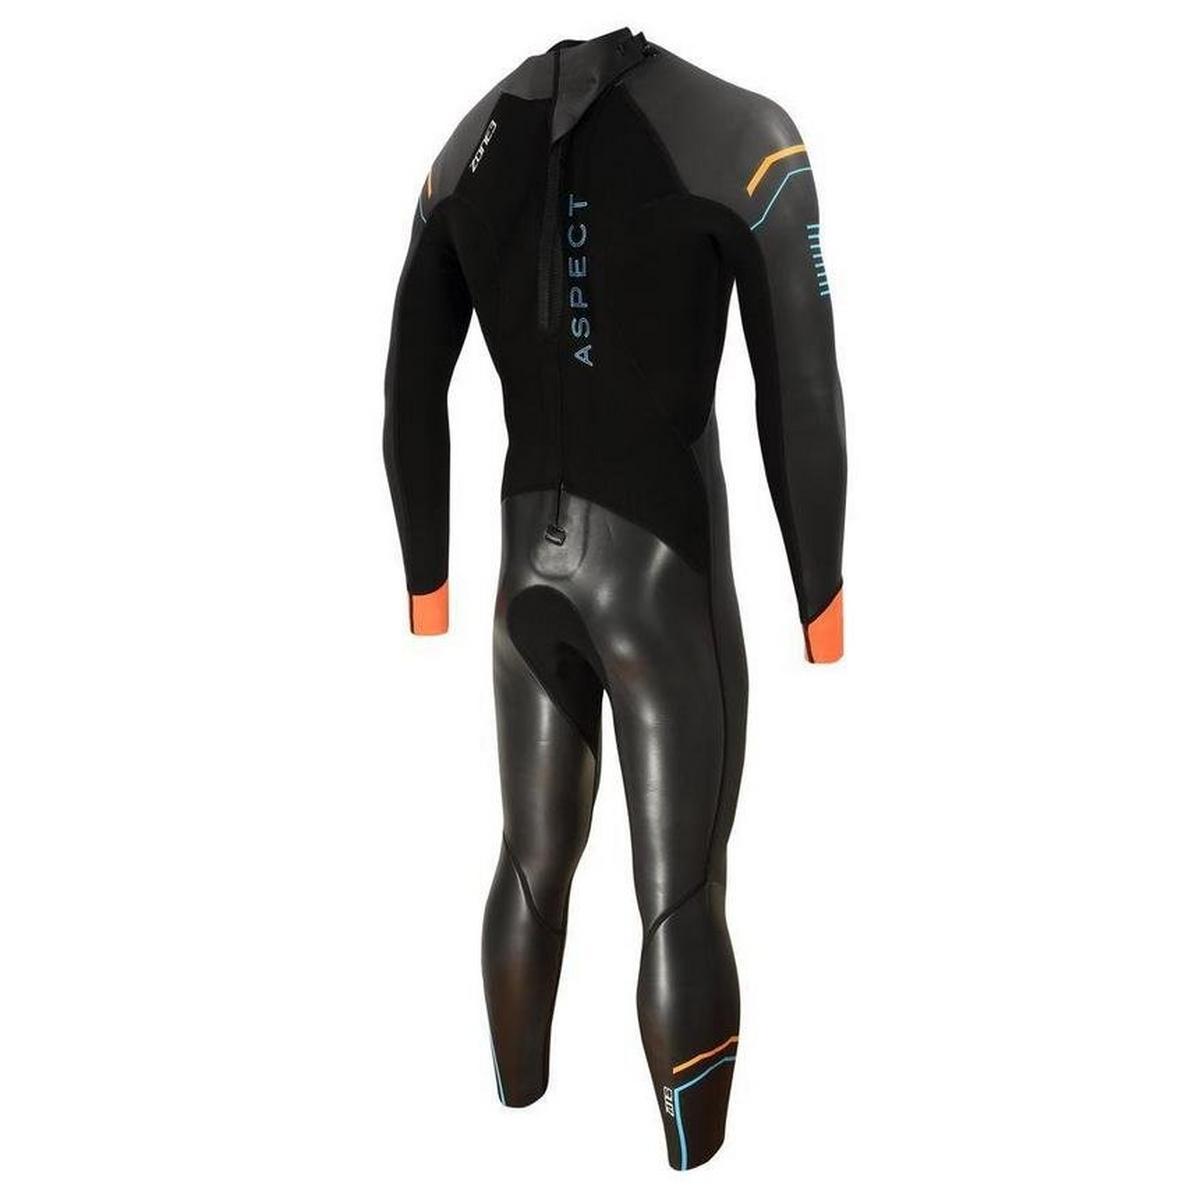 Zone3 Men's Aspect Wetsuit - Black/Blue/Orange